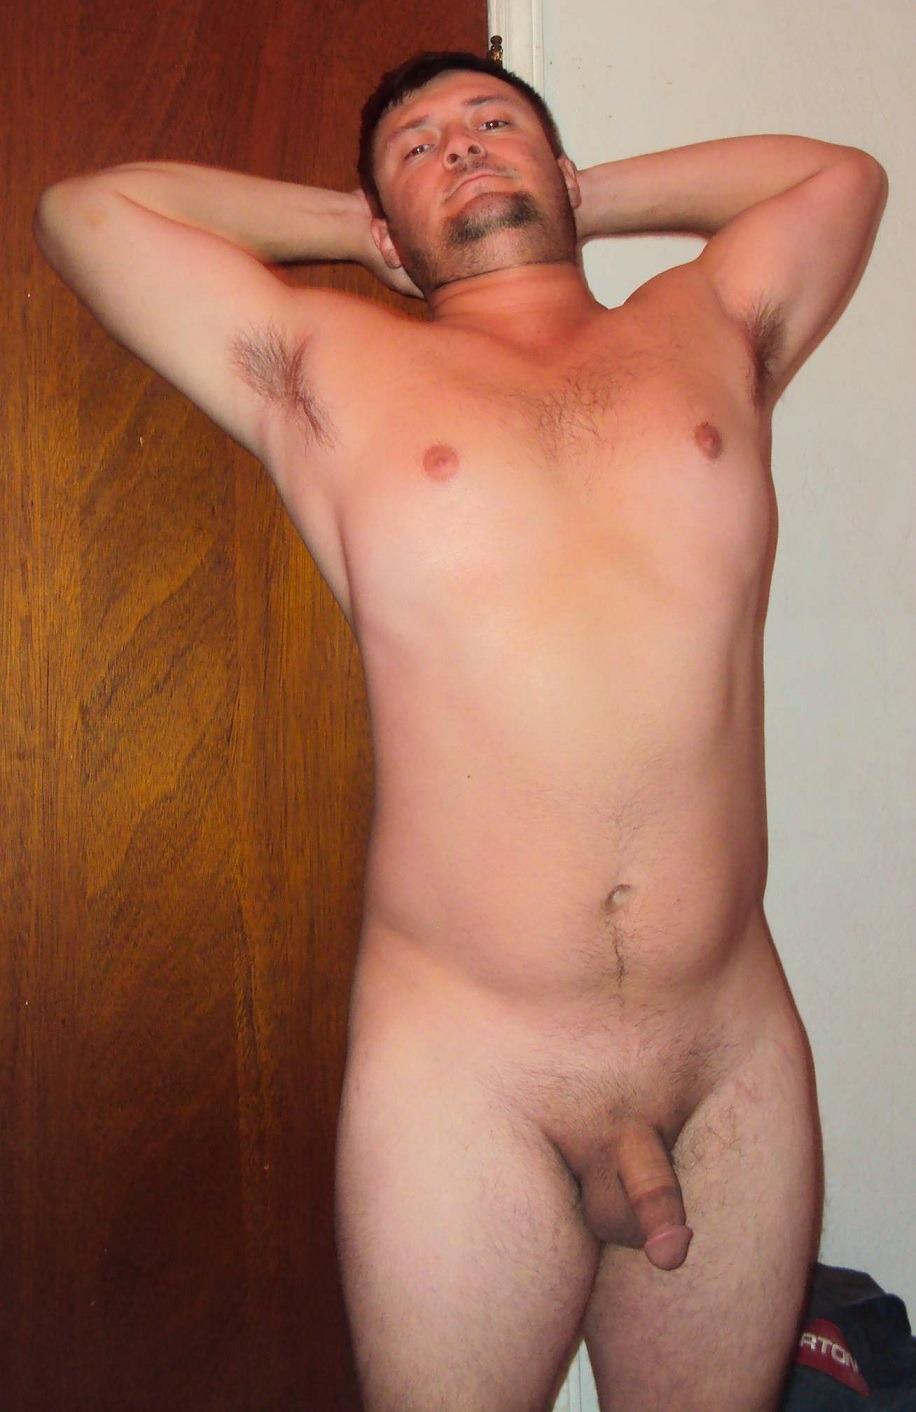 Talk. What mature average naked men